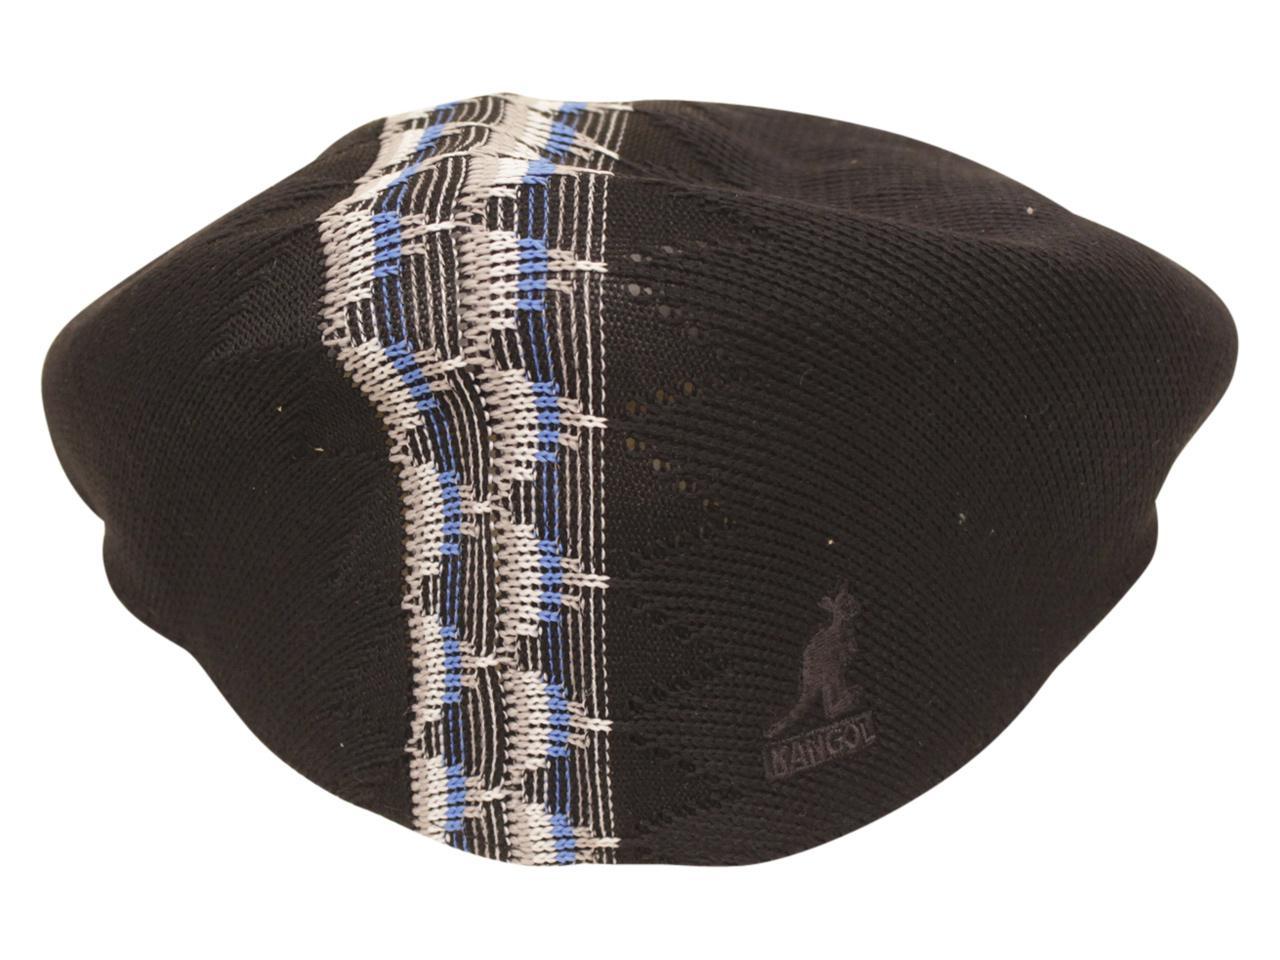 79357deebecad Kangol Men s Argyle Stripe 504 Flat Cap Hat